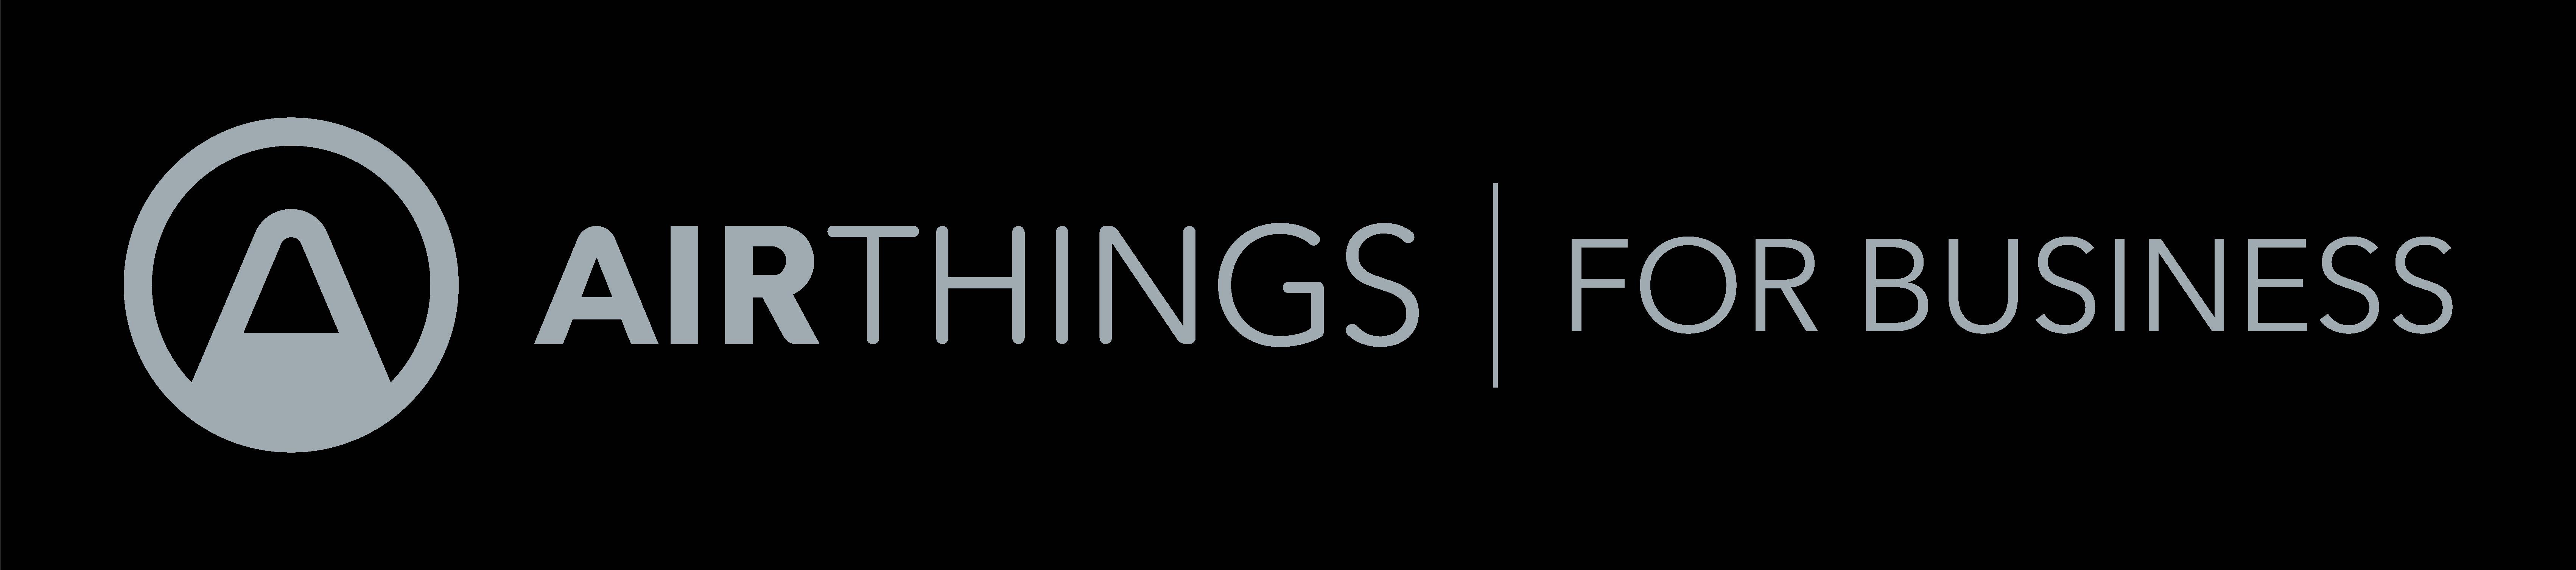 Airthings horizontal logo